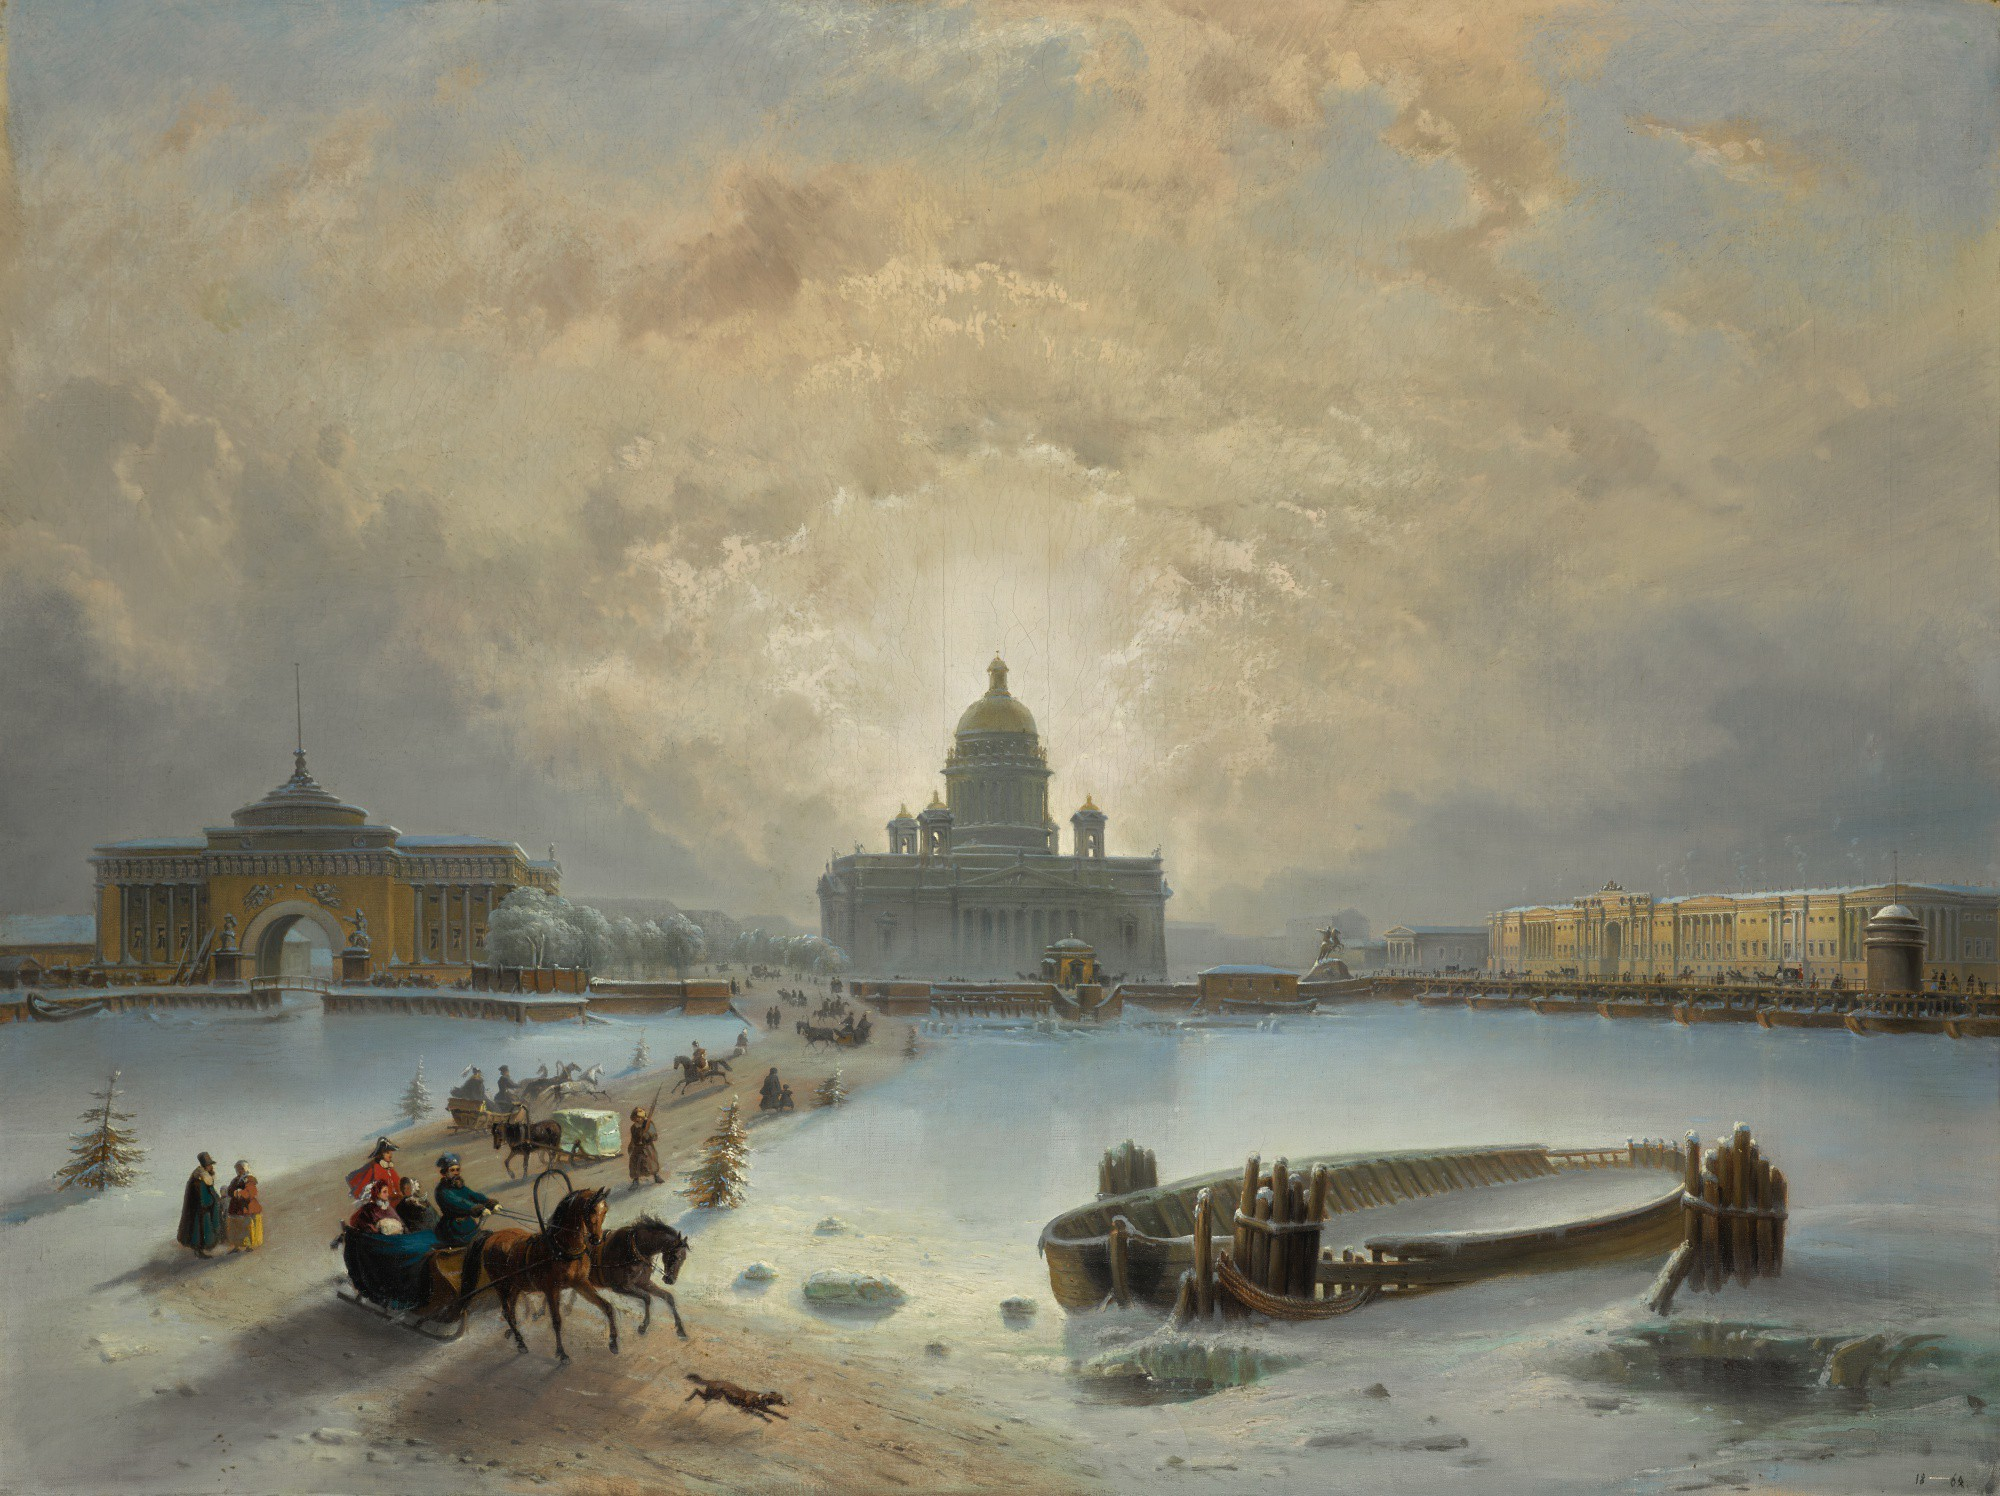 JOSEPH ANDREAS WEISS | ICE ROAD ACROSS THE NEVA